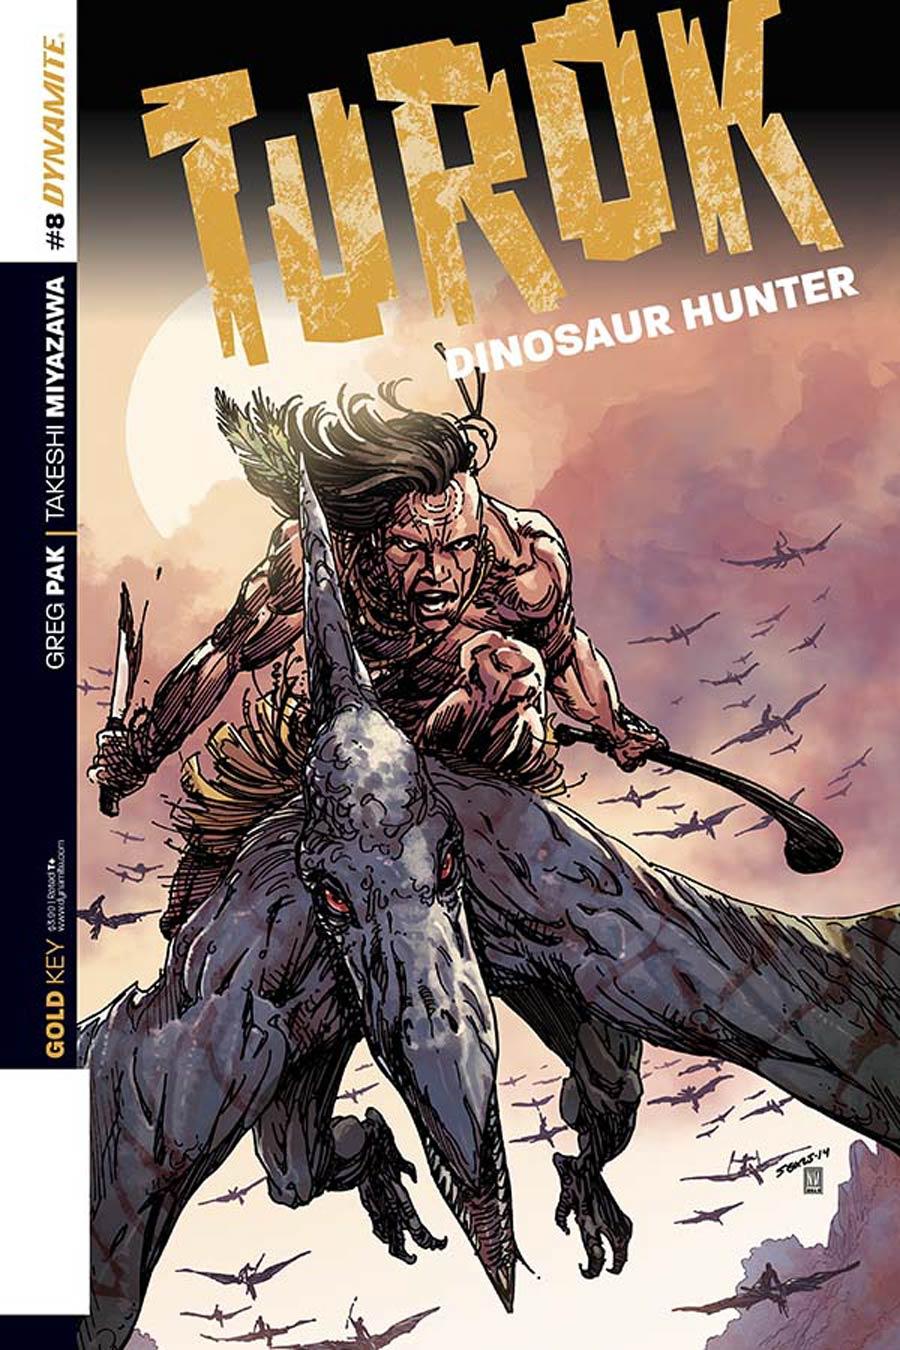 Turok Dinosaur Hunter Vol 2 #8 Cover A Regular Bart Sears Cover